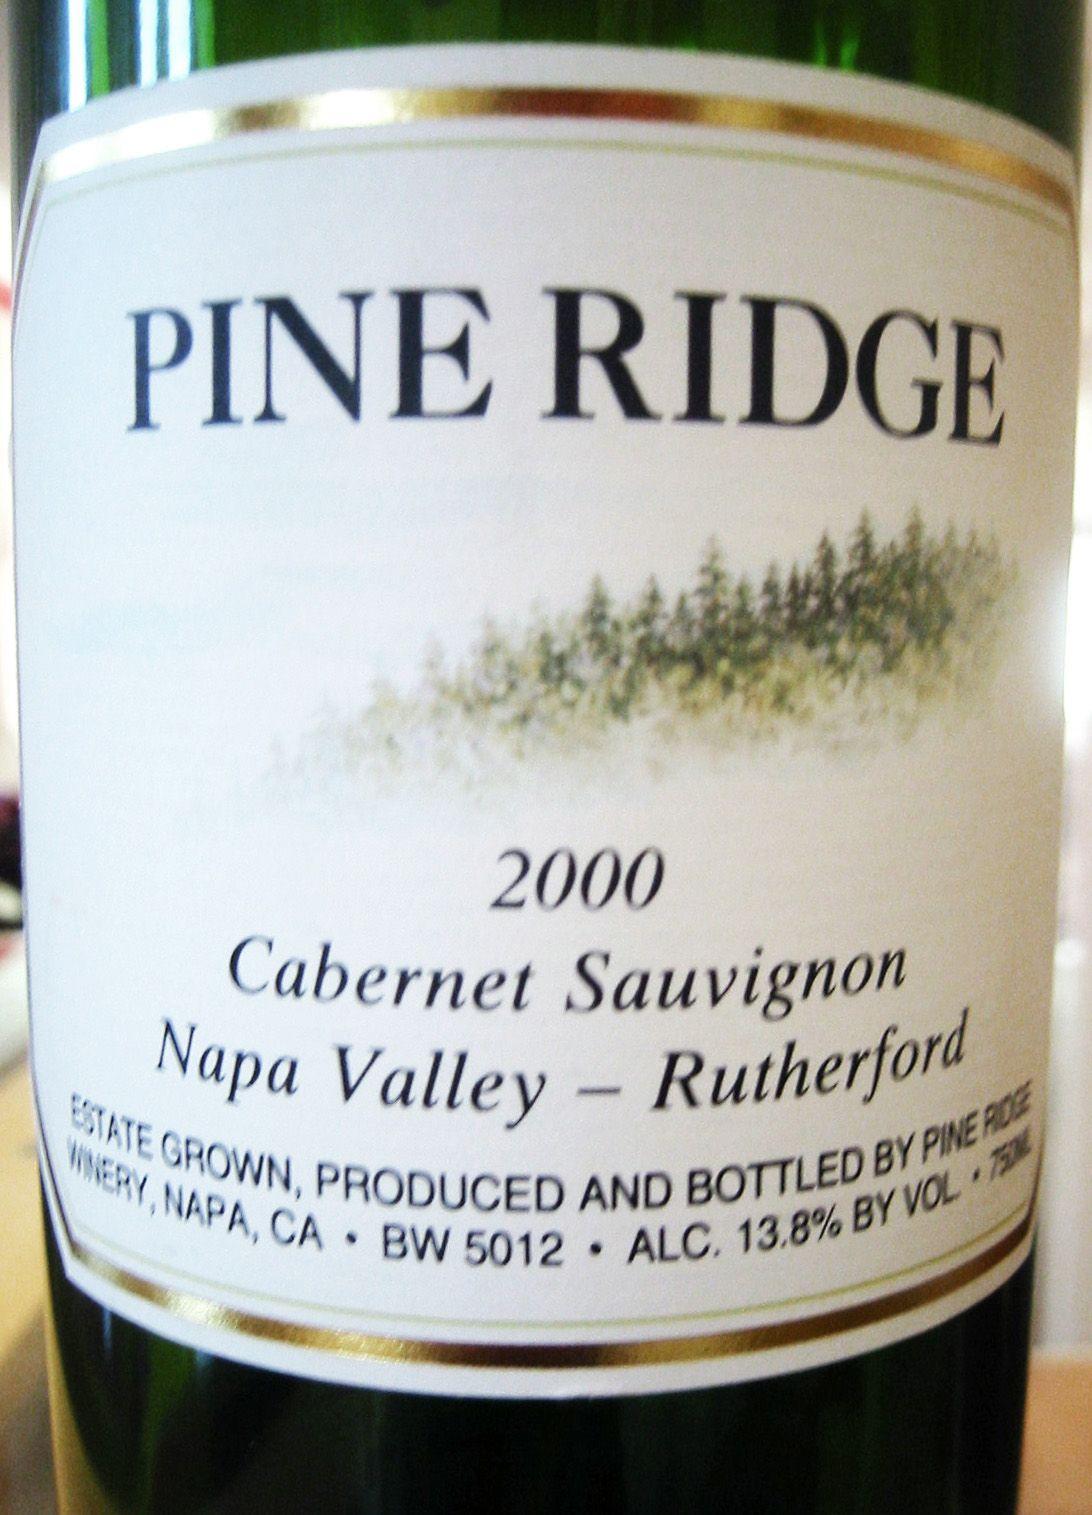 2000 Pine Ridge Napa Valley Rutherford Cabernet Sauvignon ...